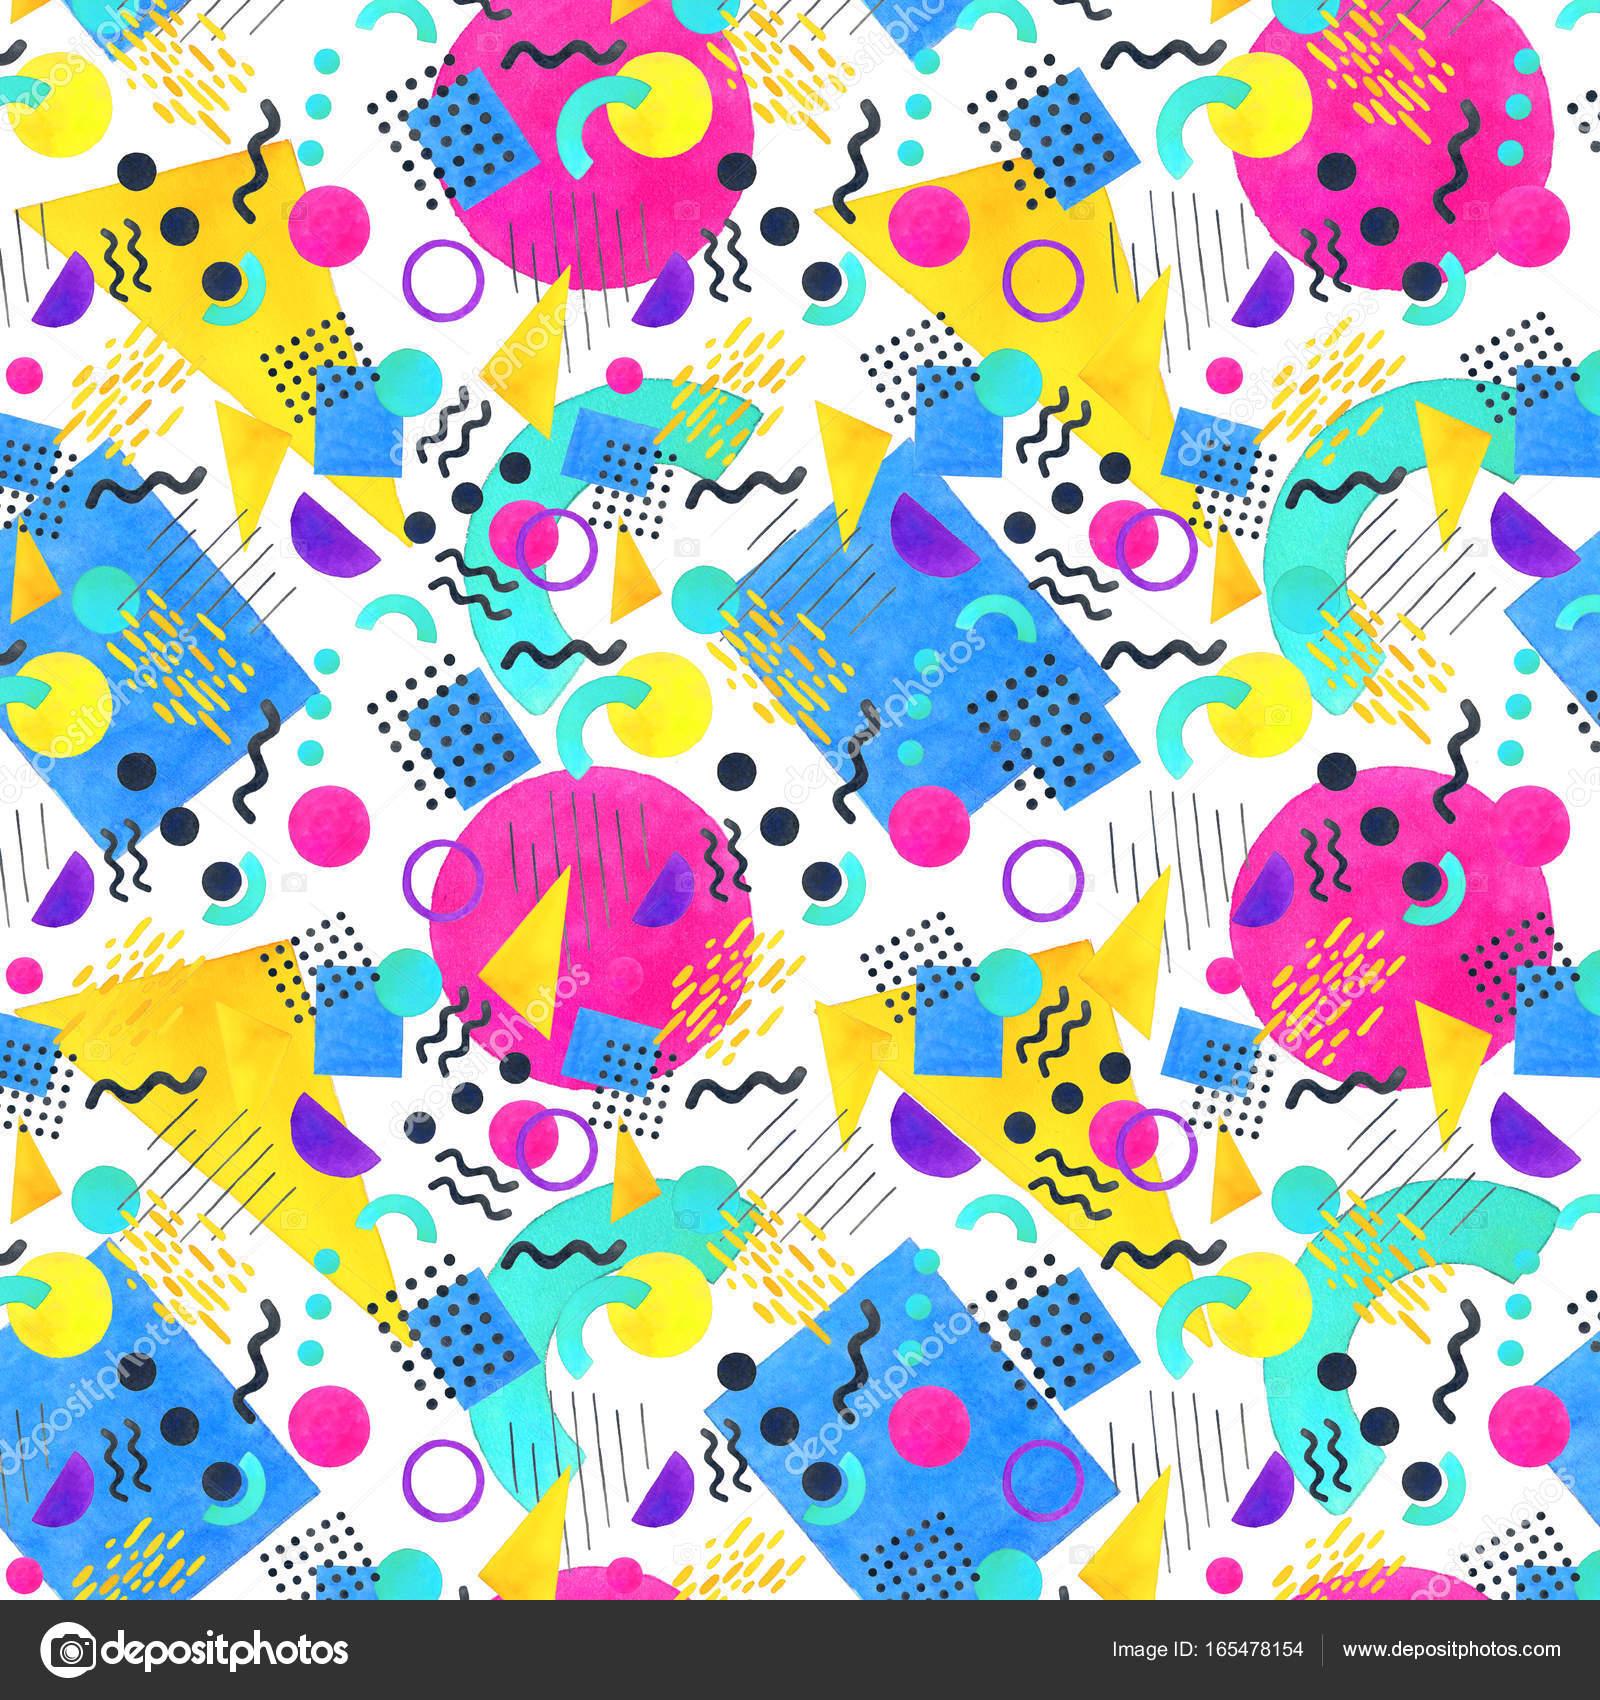 Memphis seamless pattern of geometric shapes 80's-90's